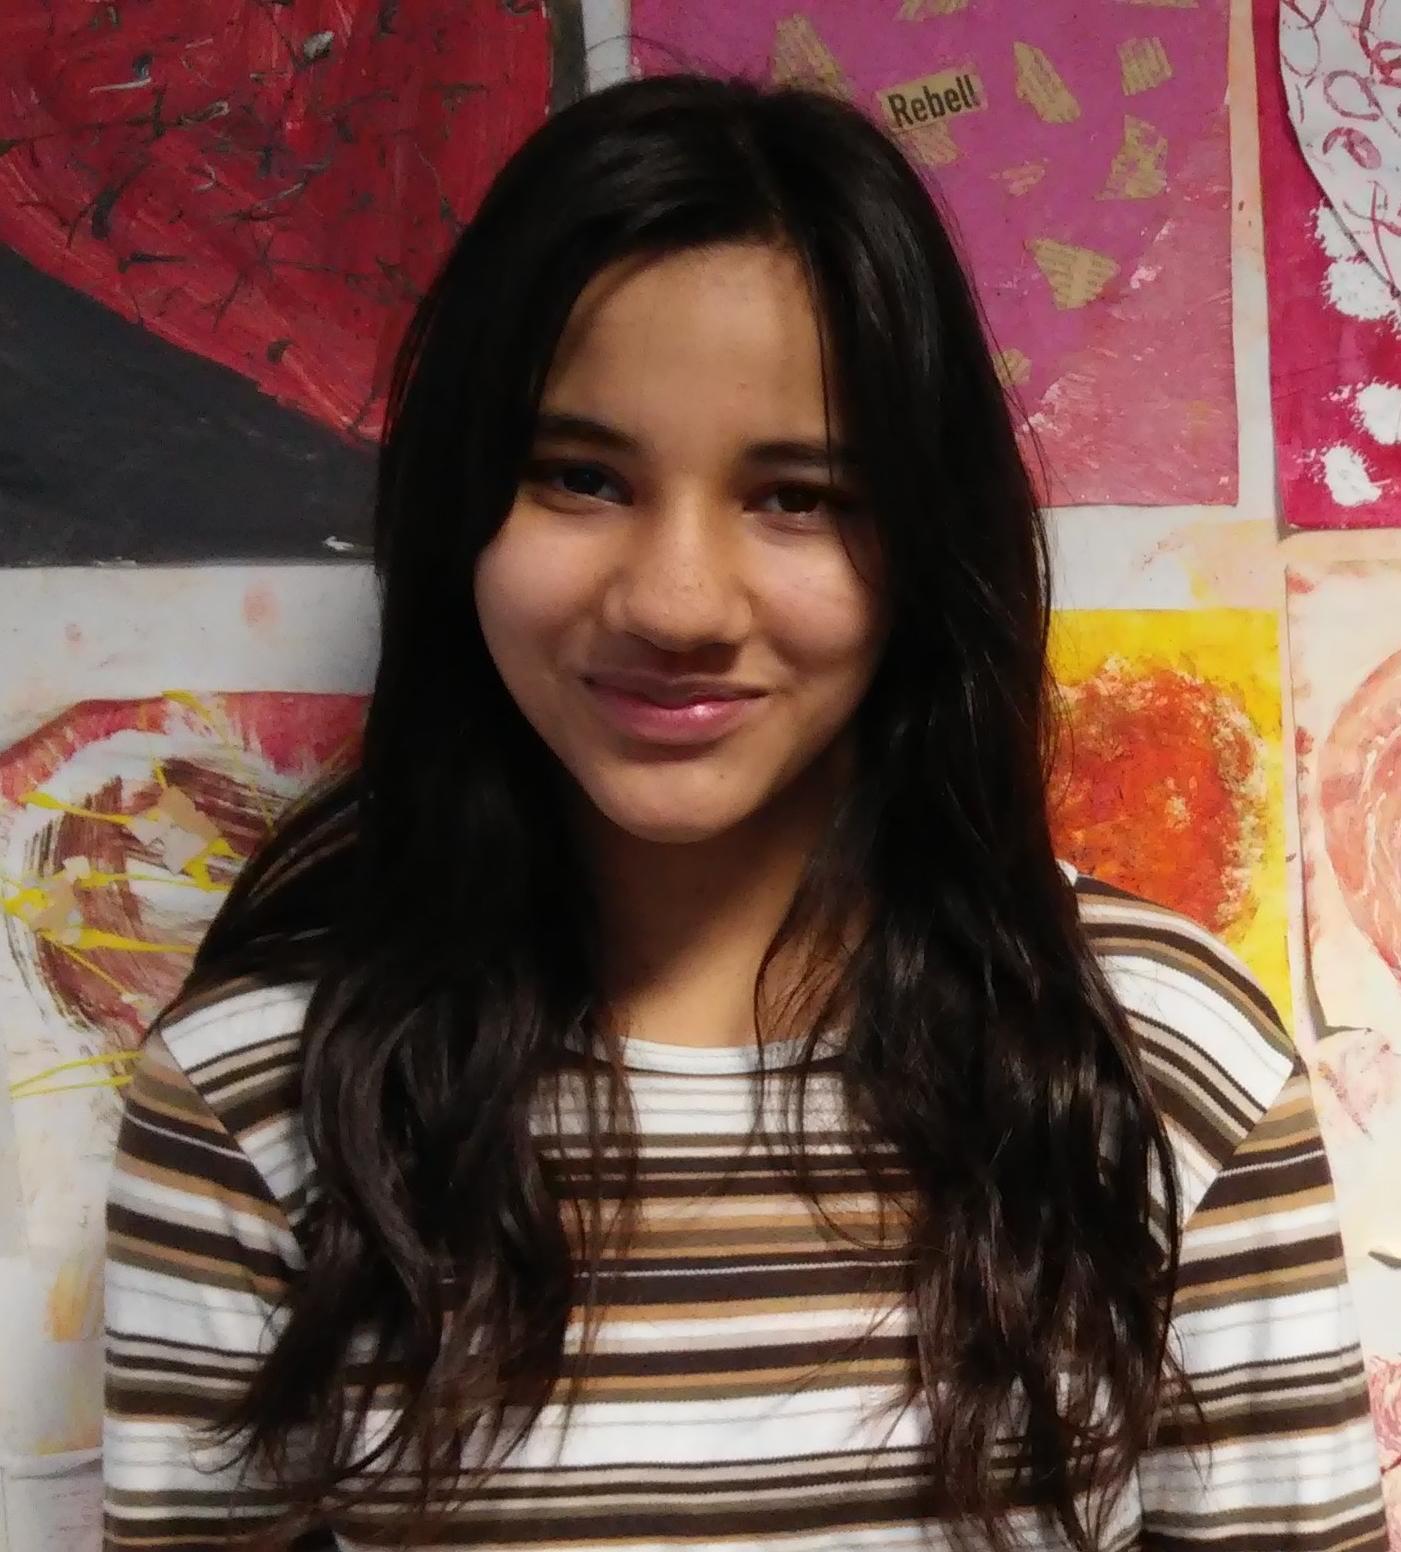 Siegerin 50m-Lauf Klasse 5 Mädchen: Salma Abdellaoui